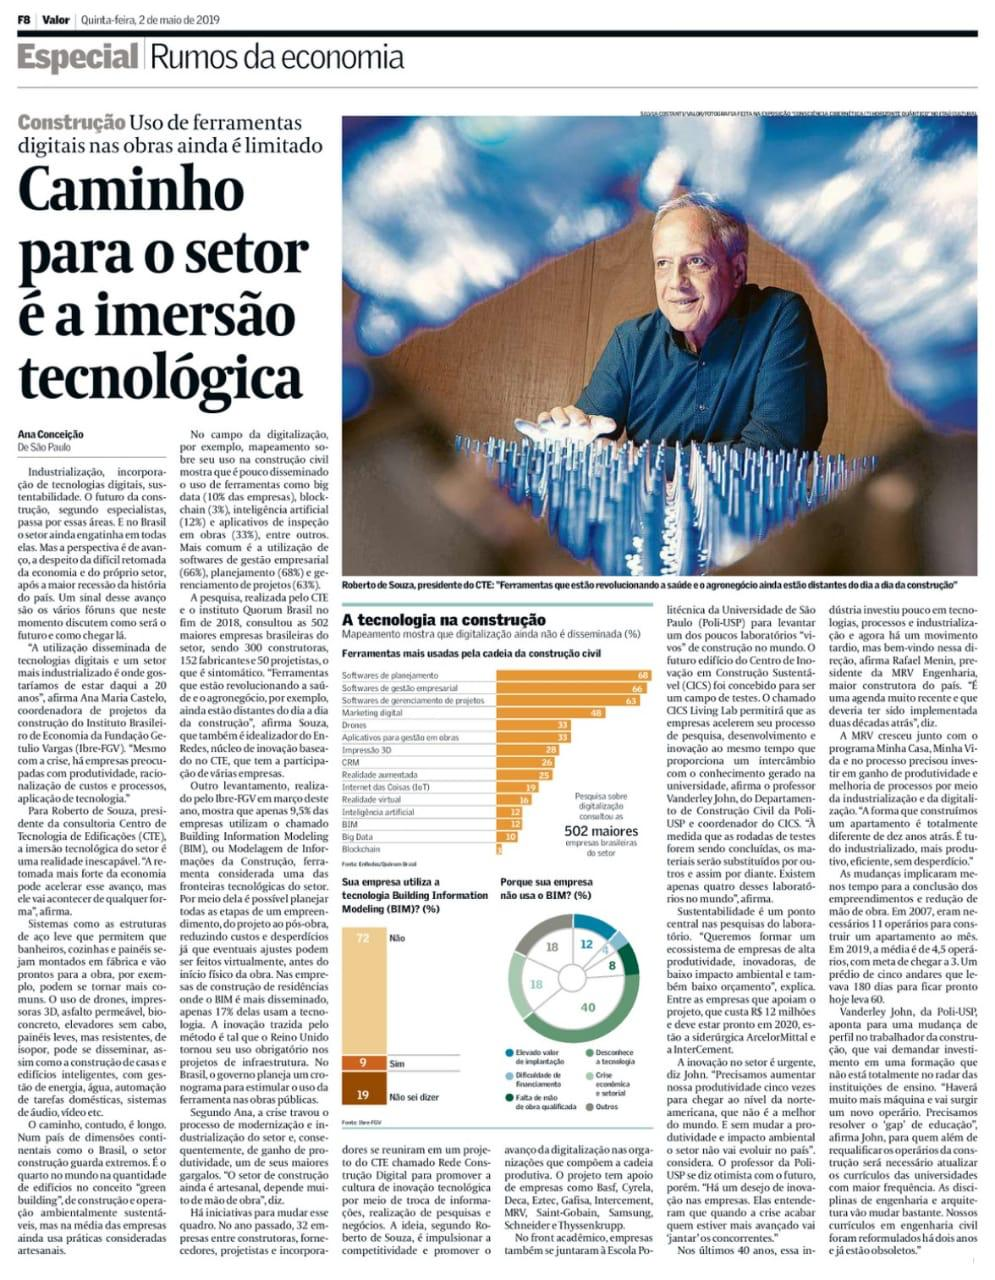 jornal-valor-economico_02-05-2019